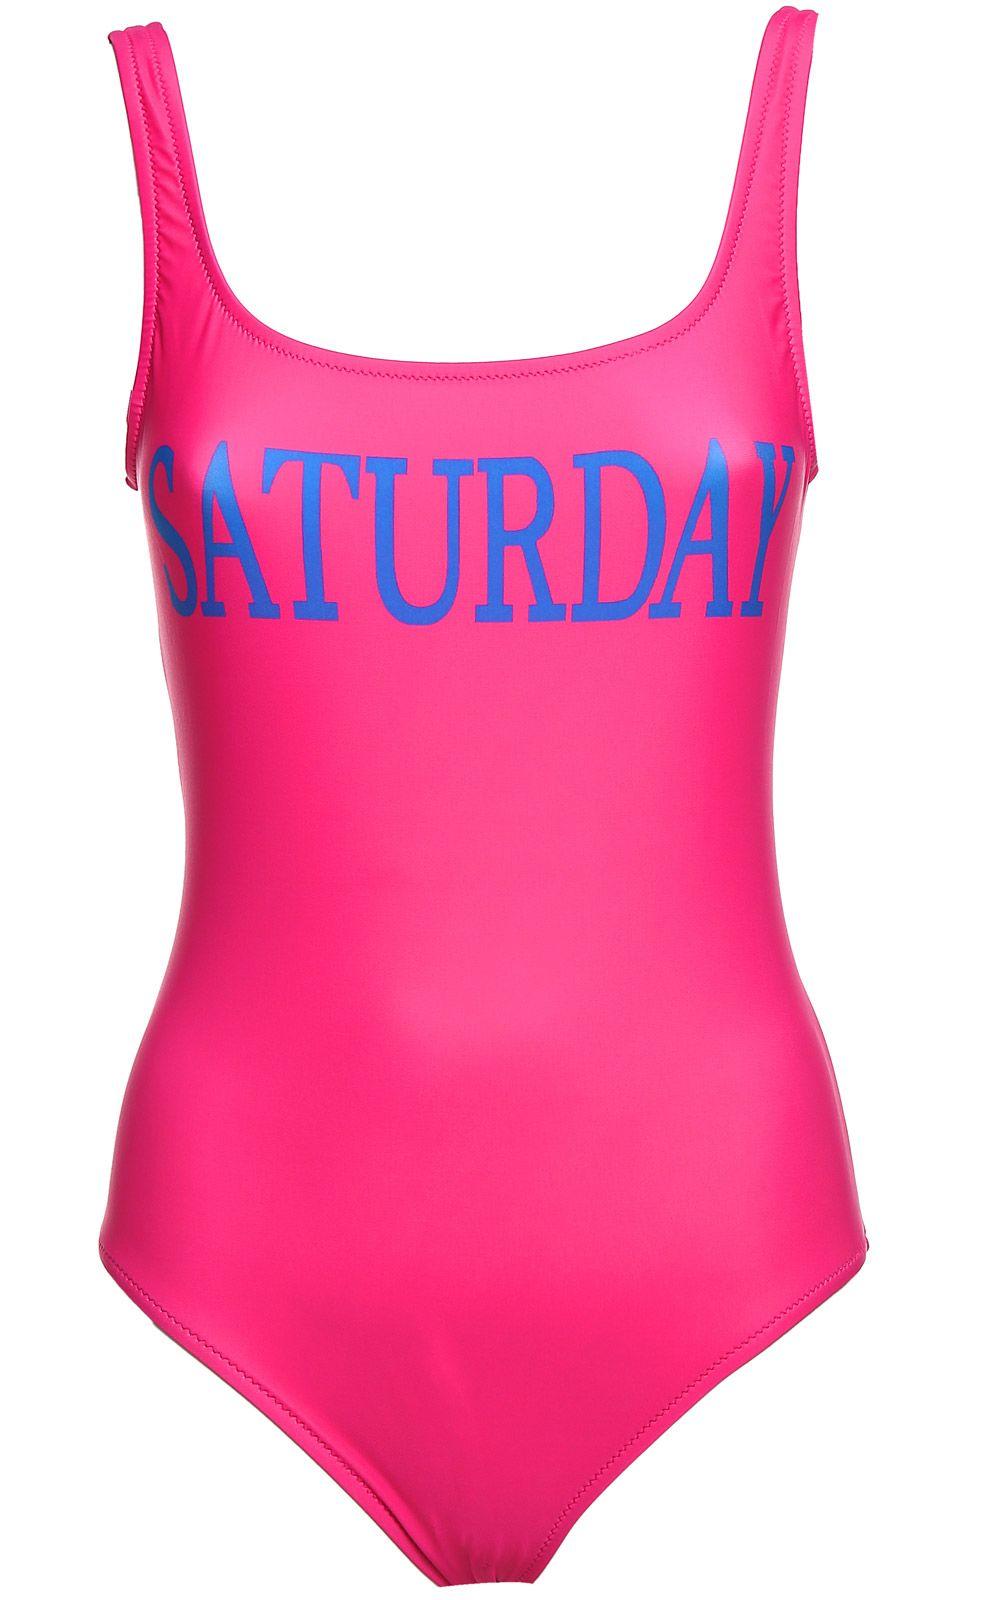 Alberta Ferretti Saturday Lycra Swimsuit